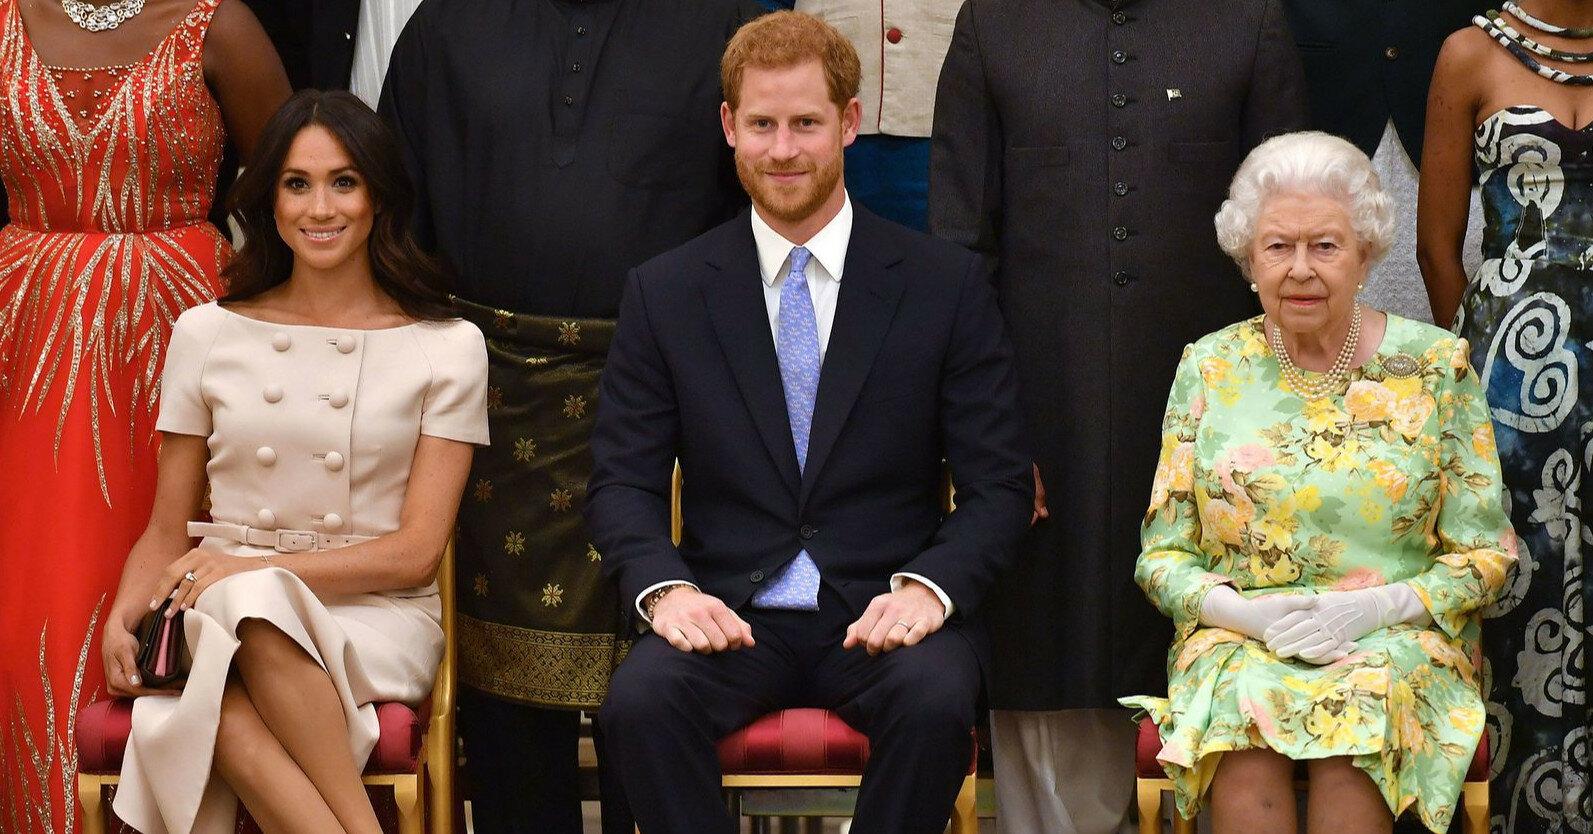 Меган Маркл и принц Гарри подадут в суд на BBC